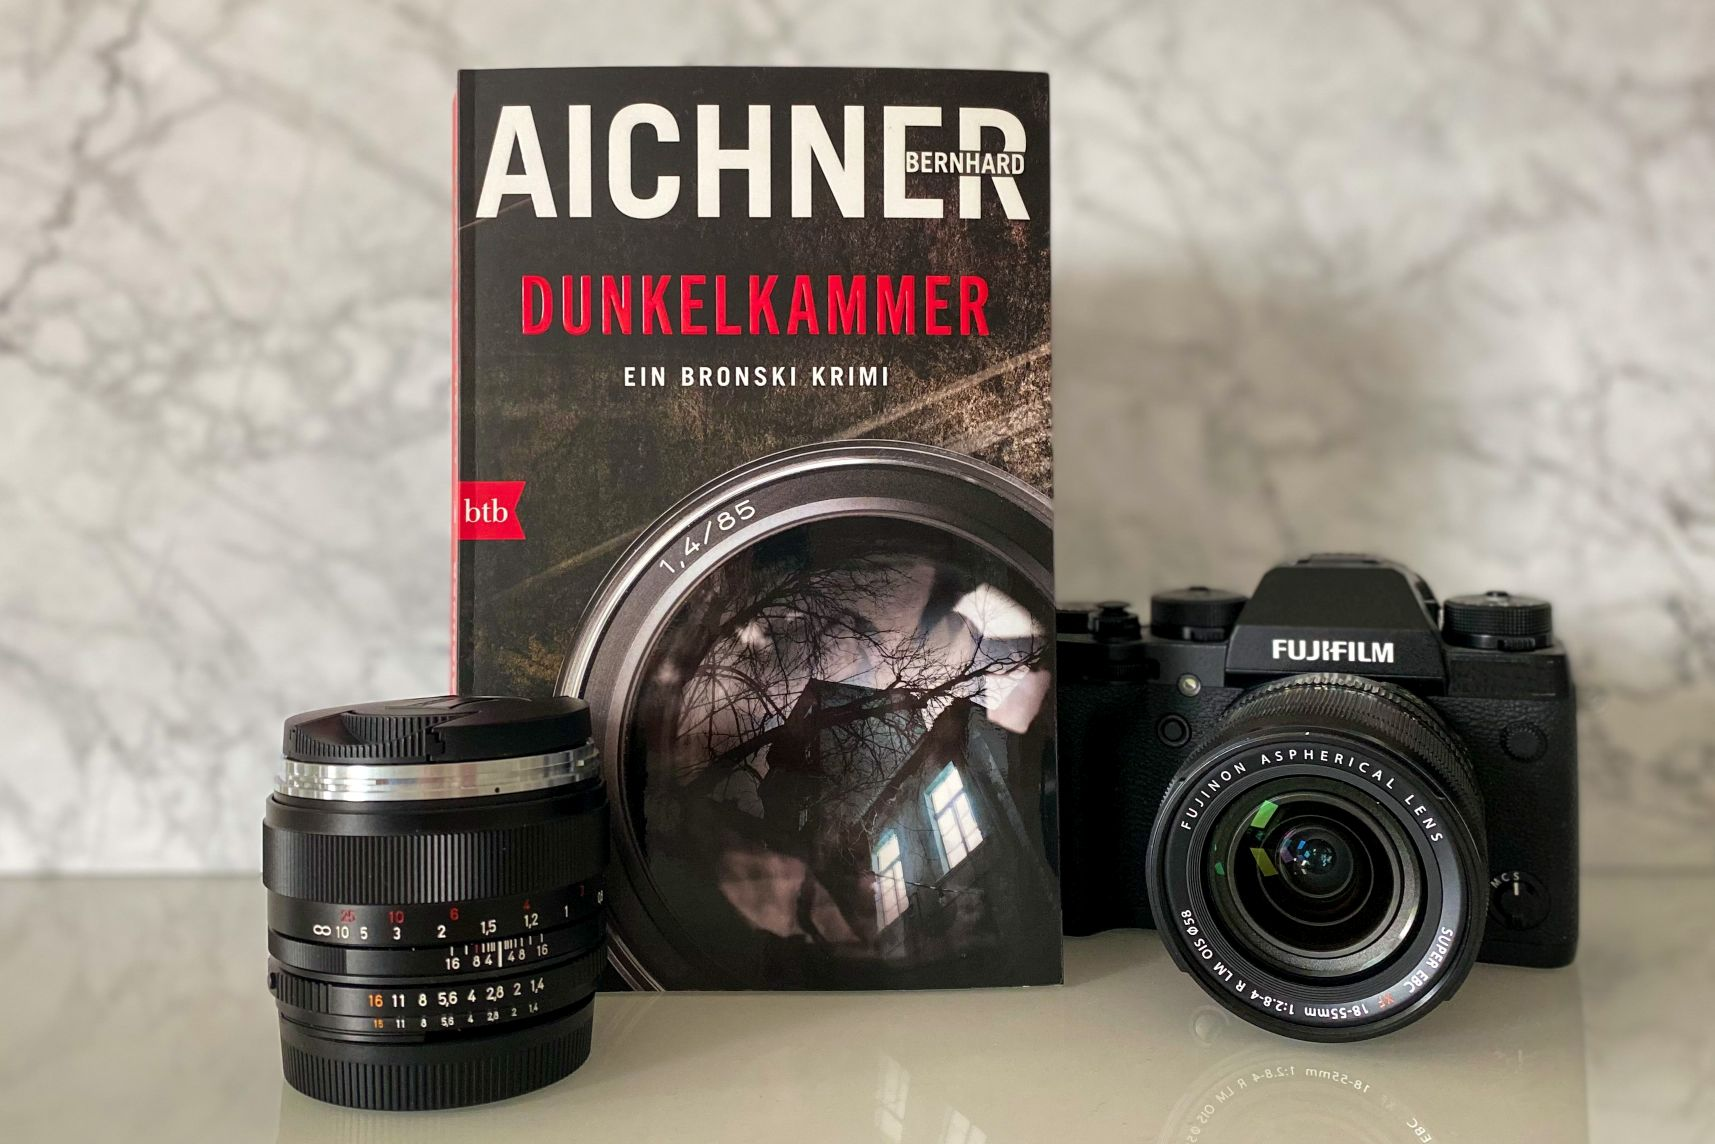 Bernhard Aichner Dunkelkammer David Bronski Innsbruck Berlin Pressefotograf